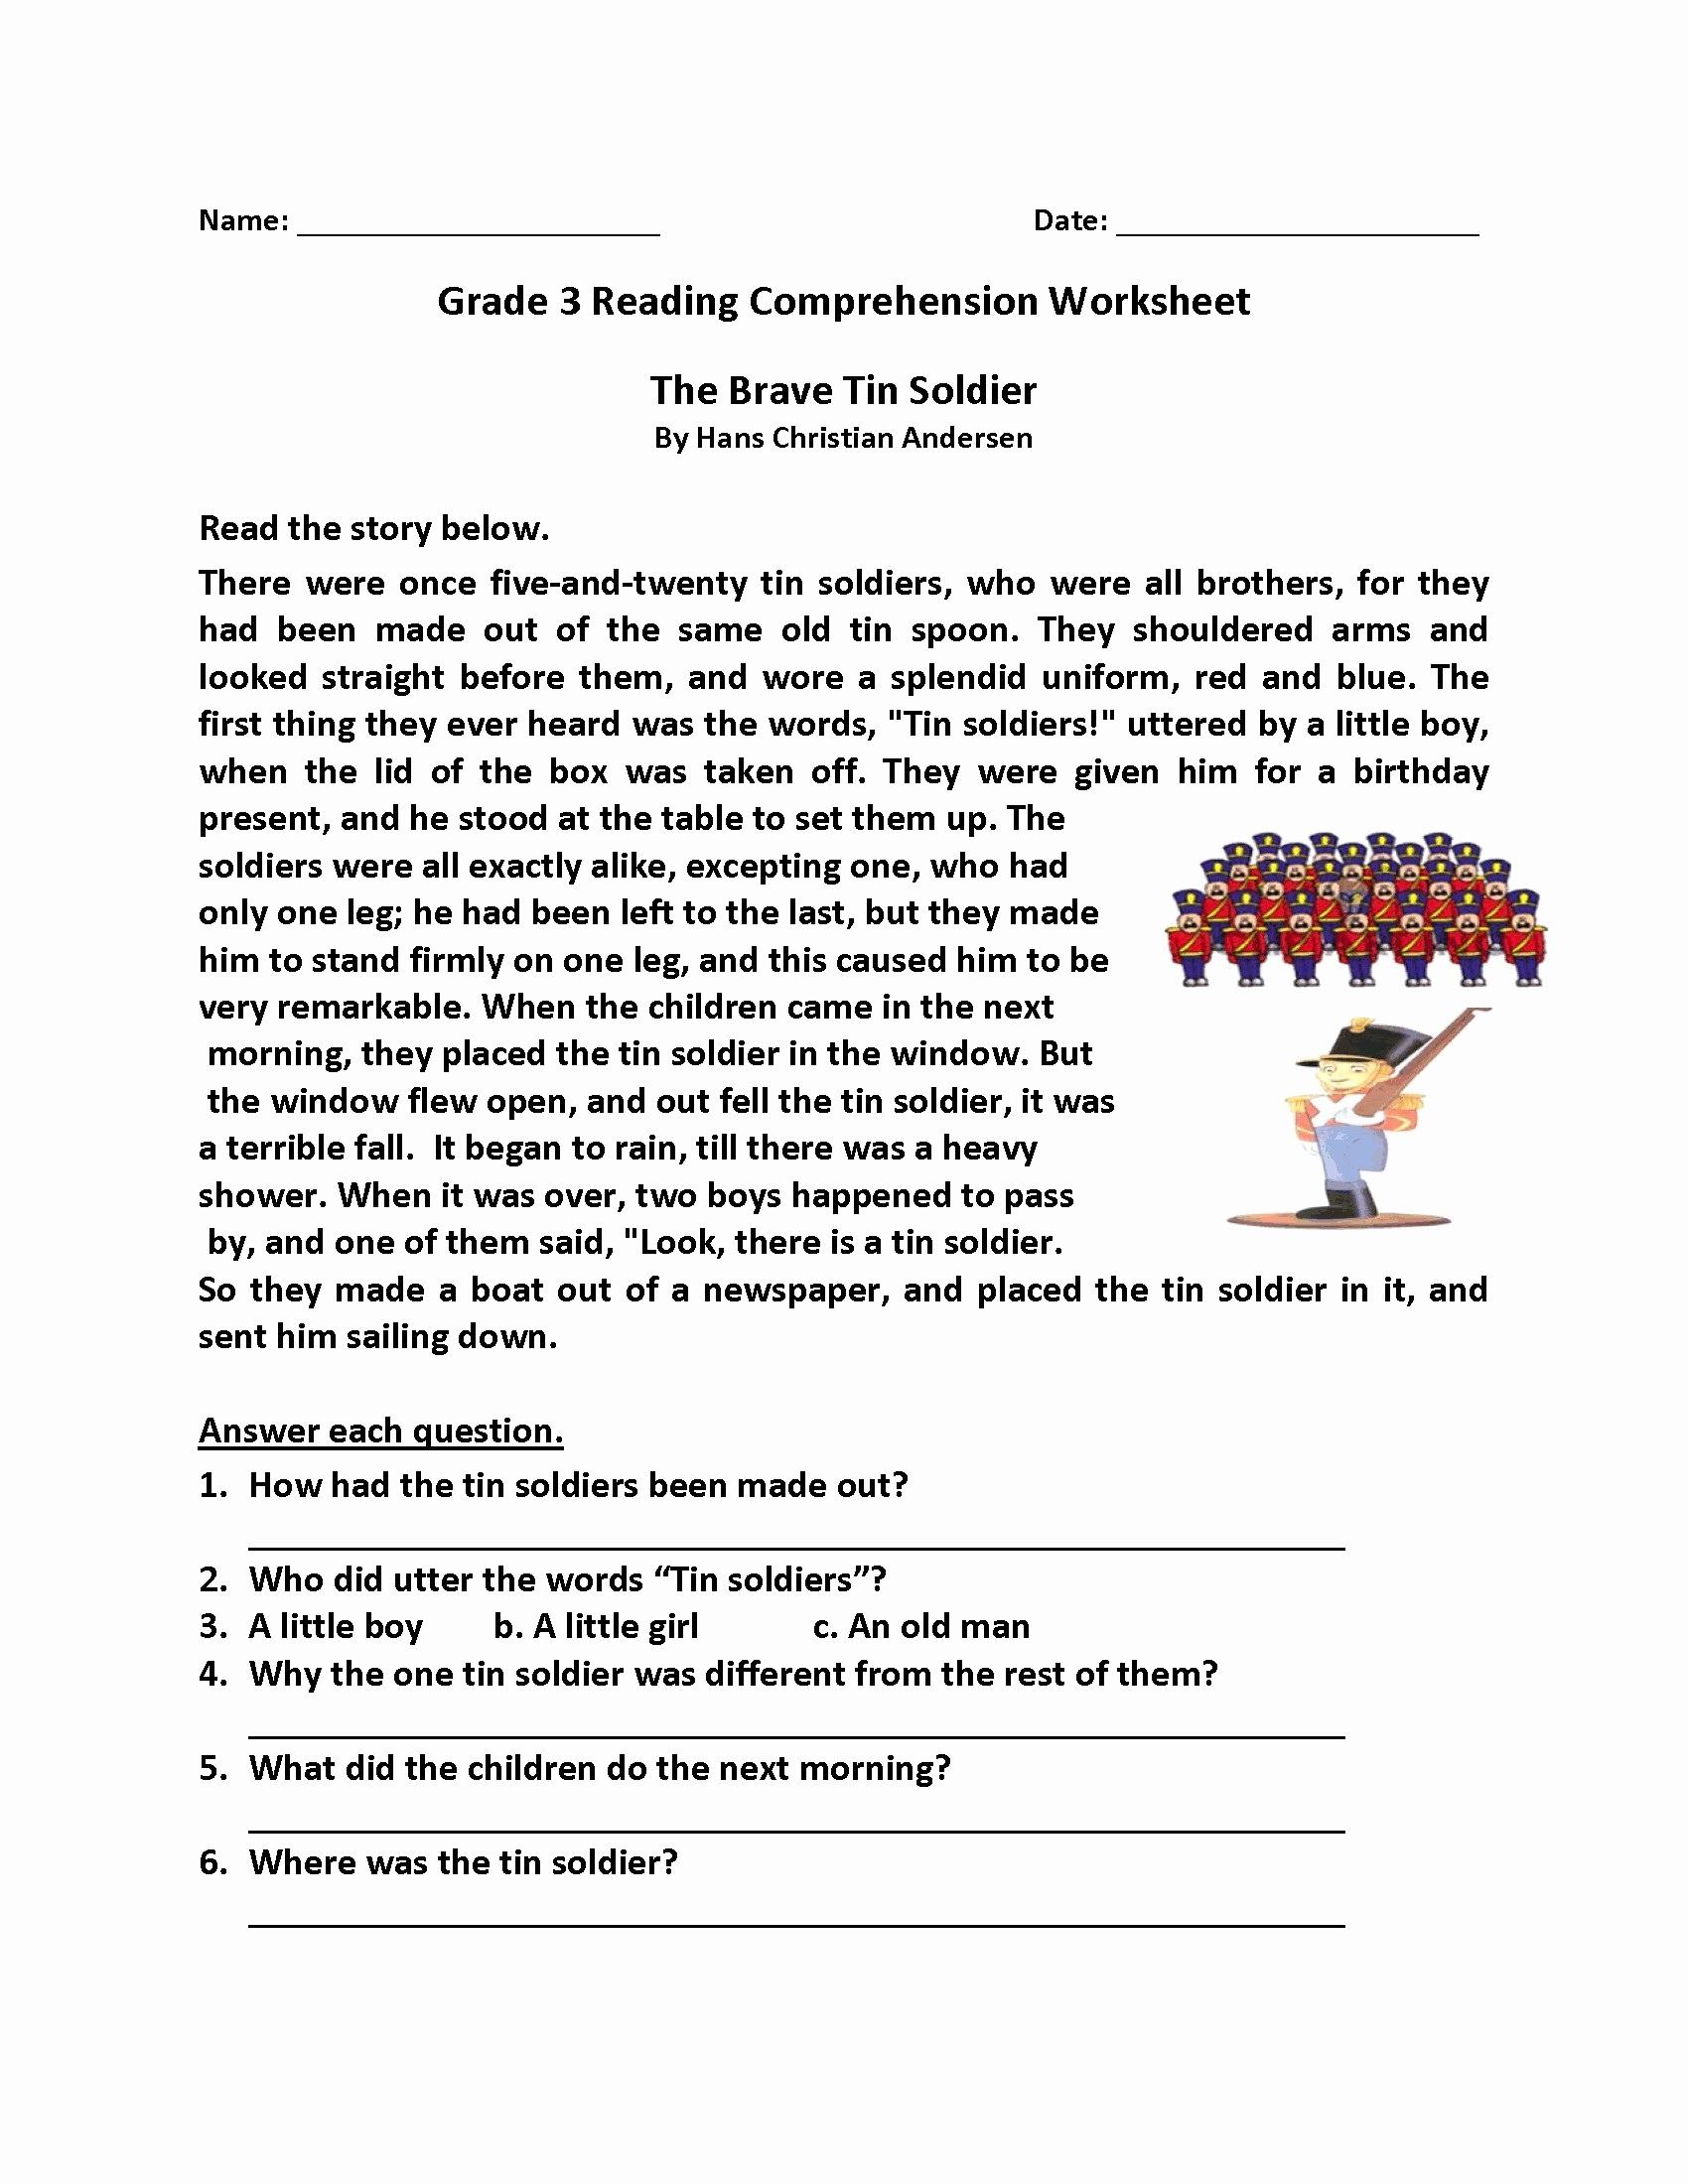 Proofreading Worksheets 3rd Grade New top 3rd Grade Homework Sheet